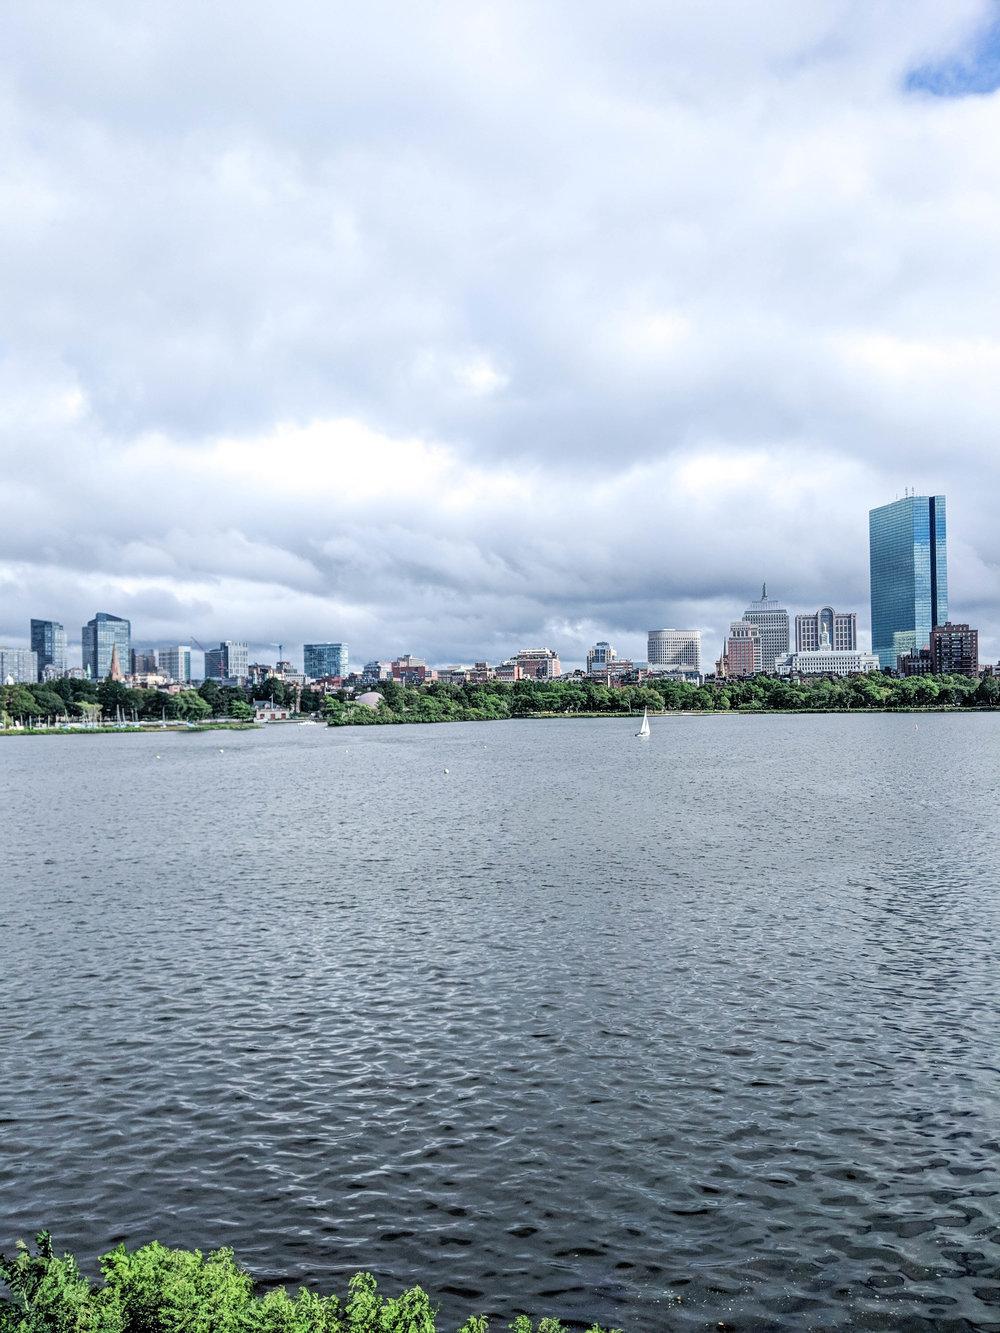 bri rinehart; photography; boston; city